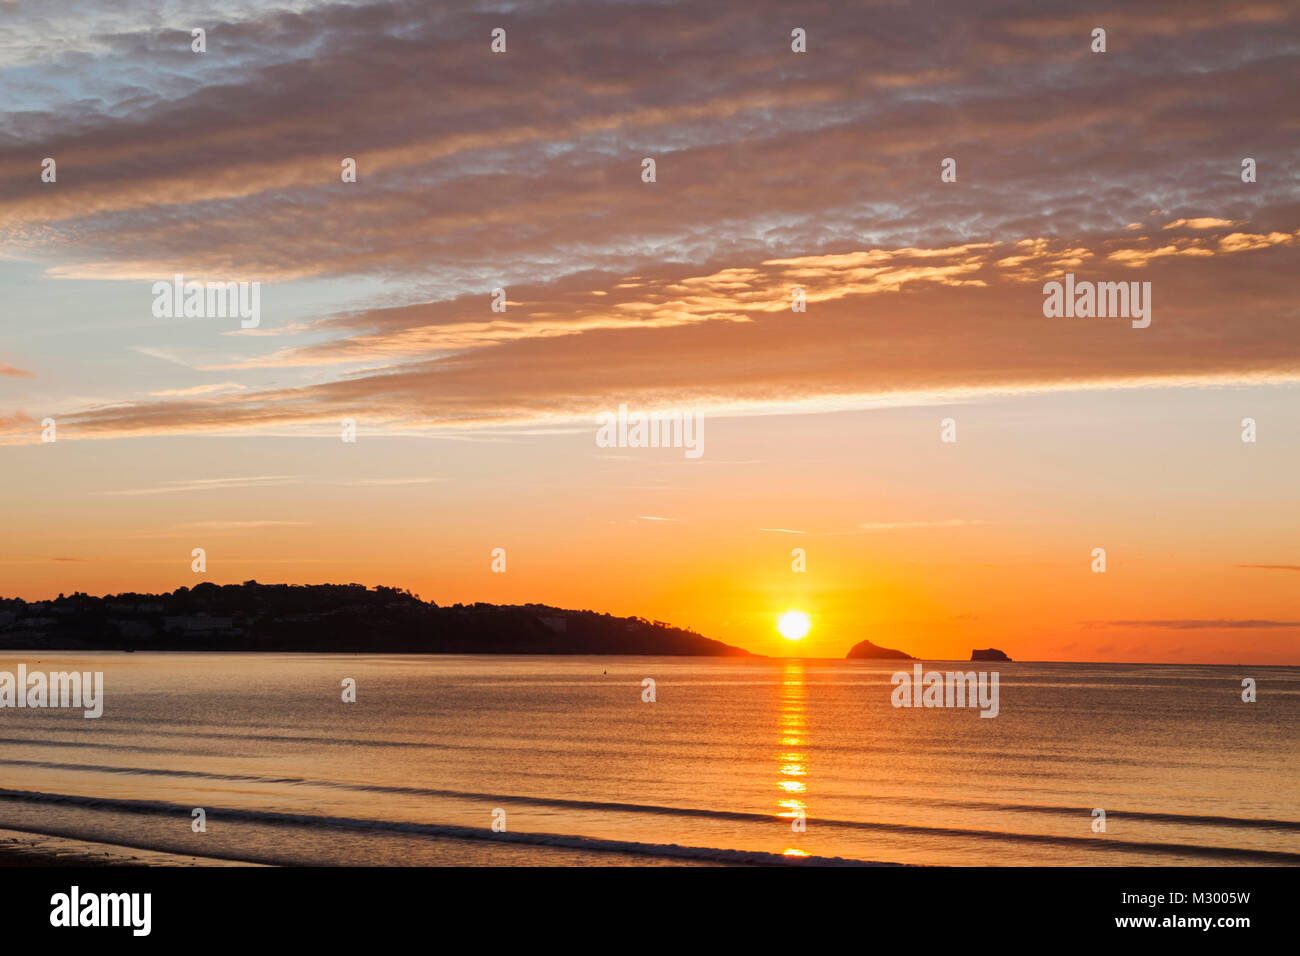 England, Devon, Torquay, Sunrise Over Torbay - Stock Image